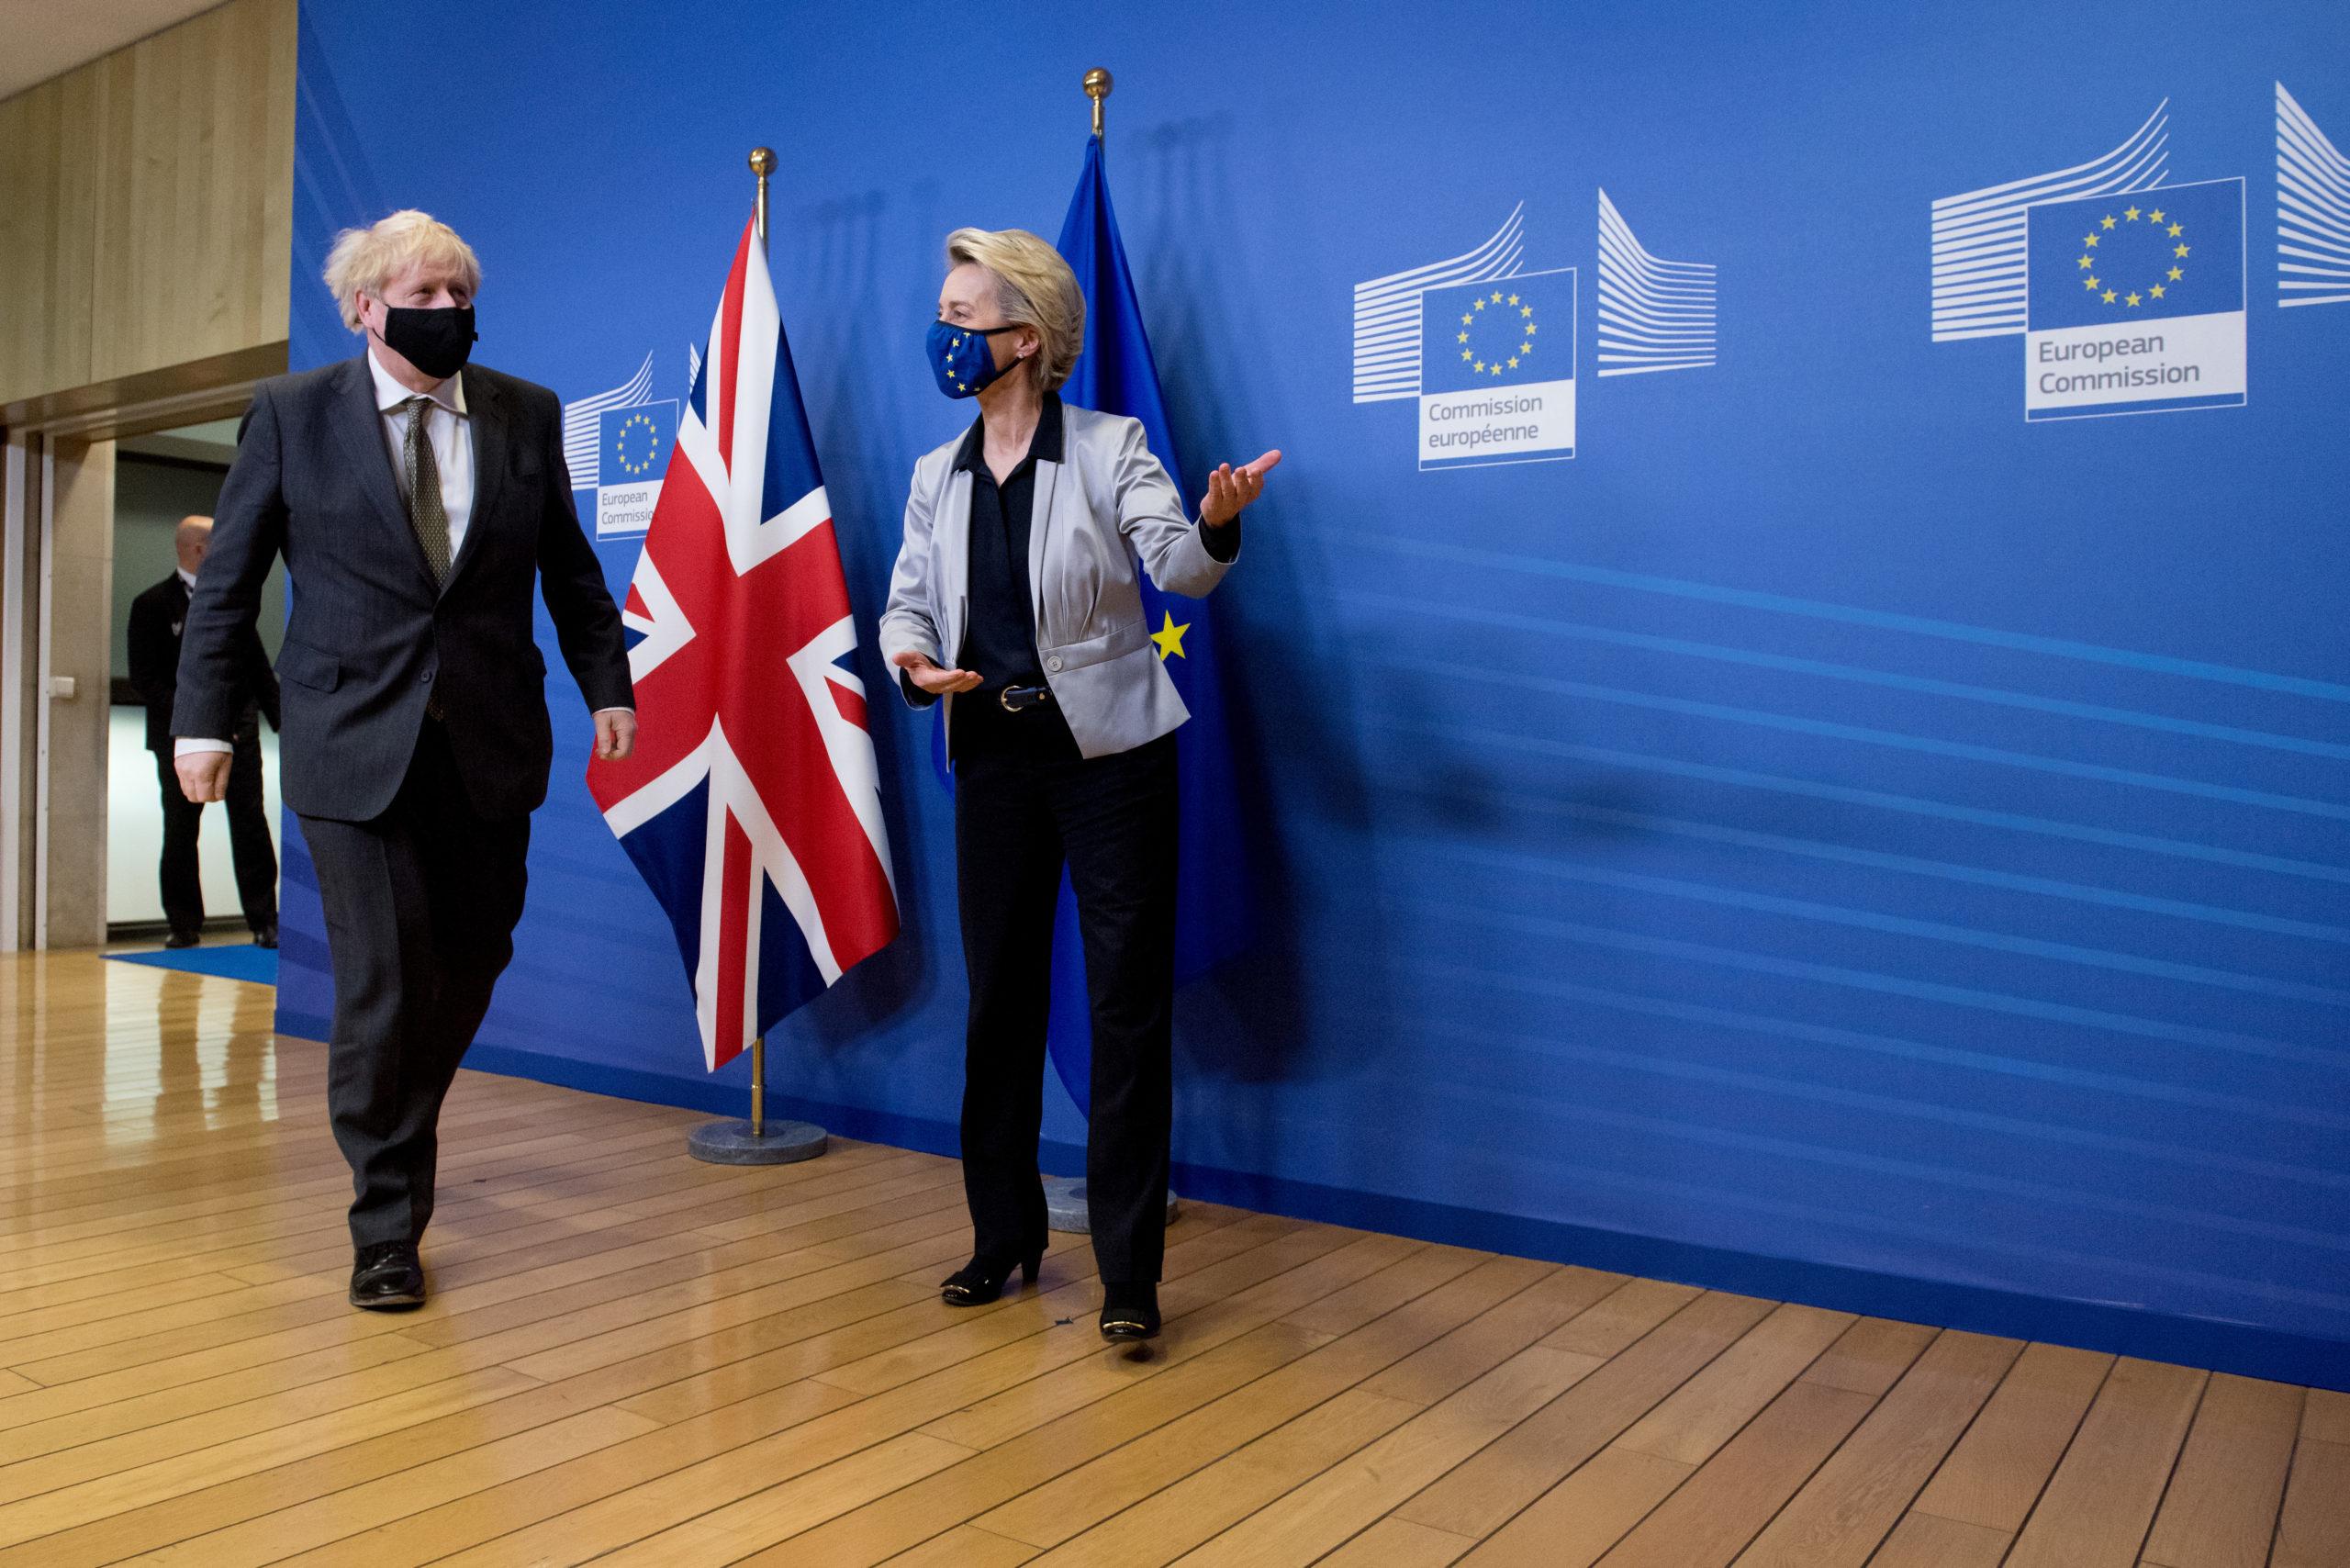 Il premier Boris Johnson e Usula von der Leyen / European Union, 2020 Source: EC - Audiovisual Service